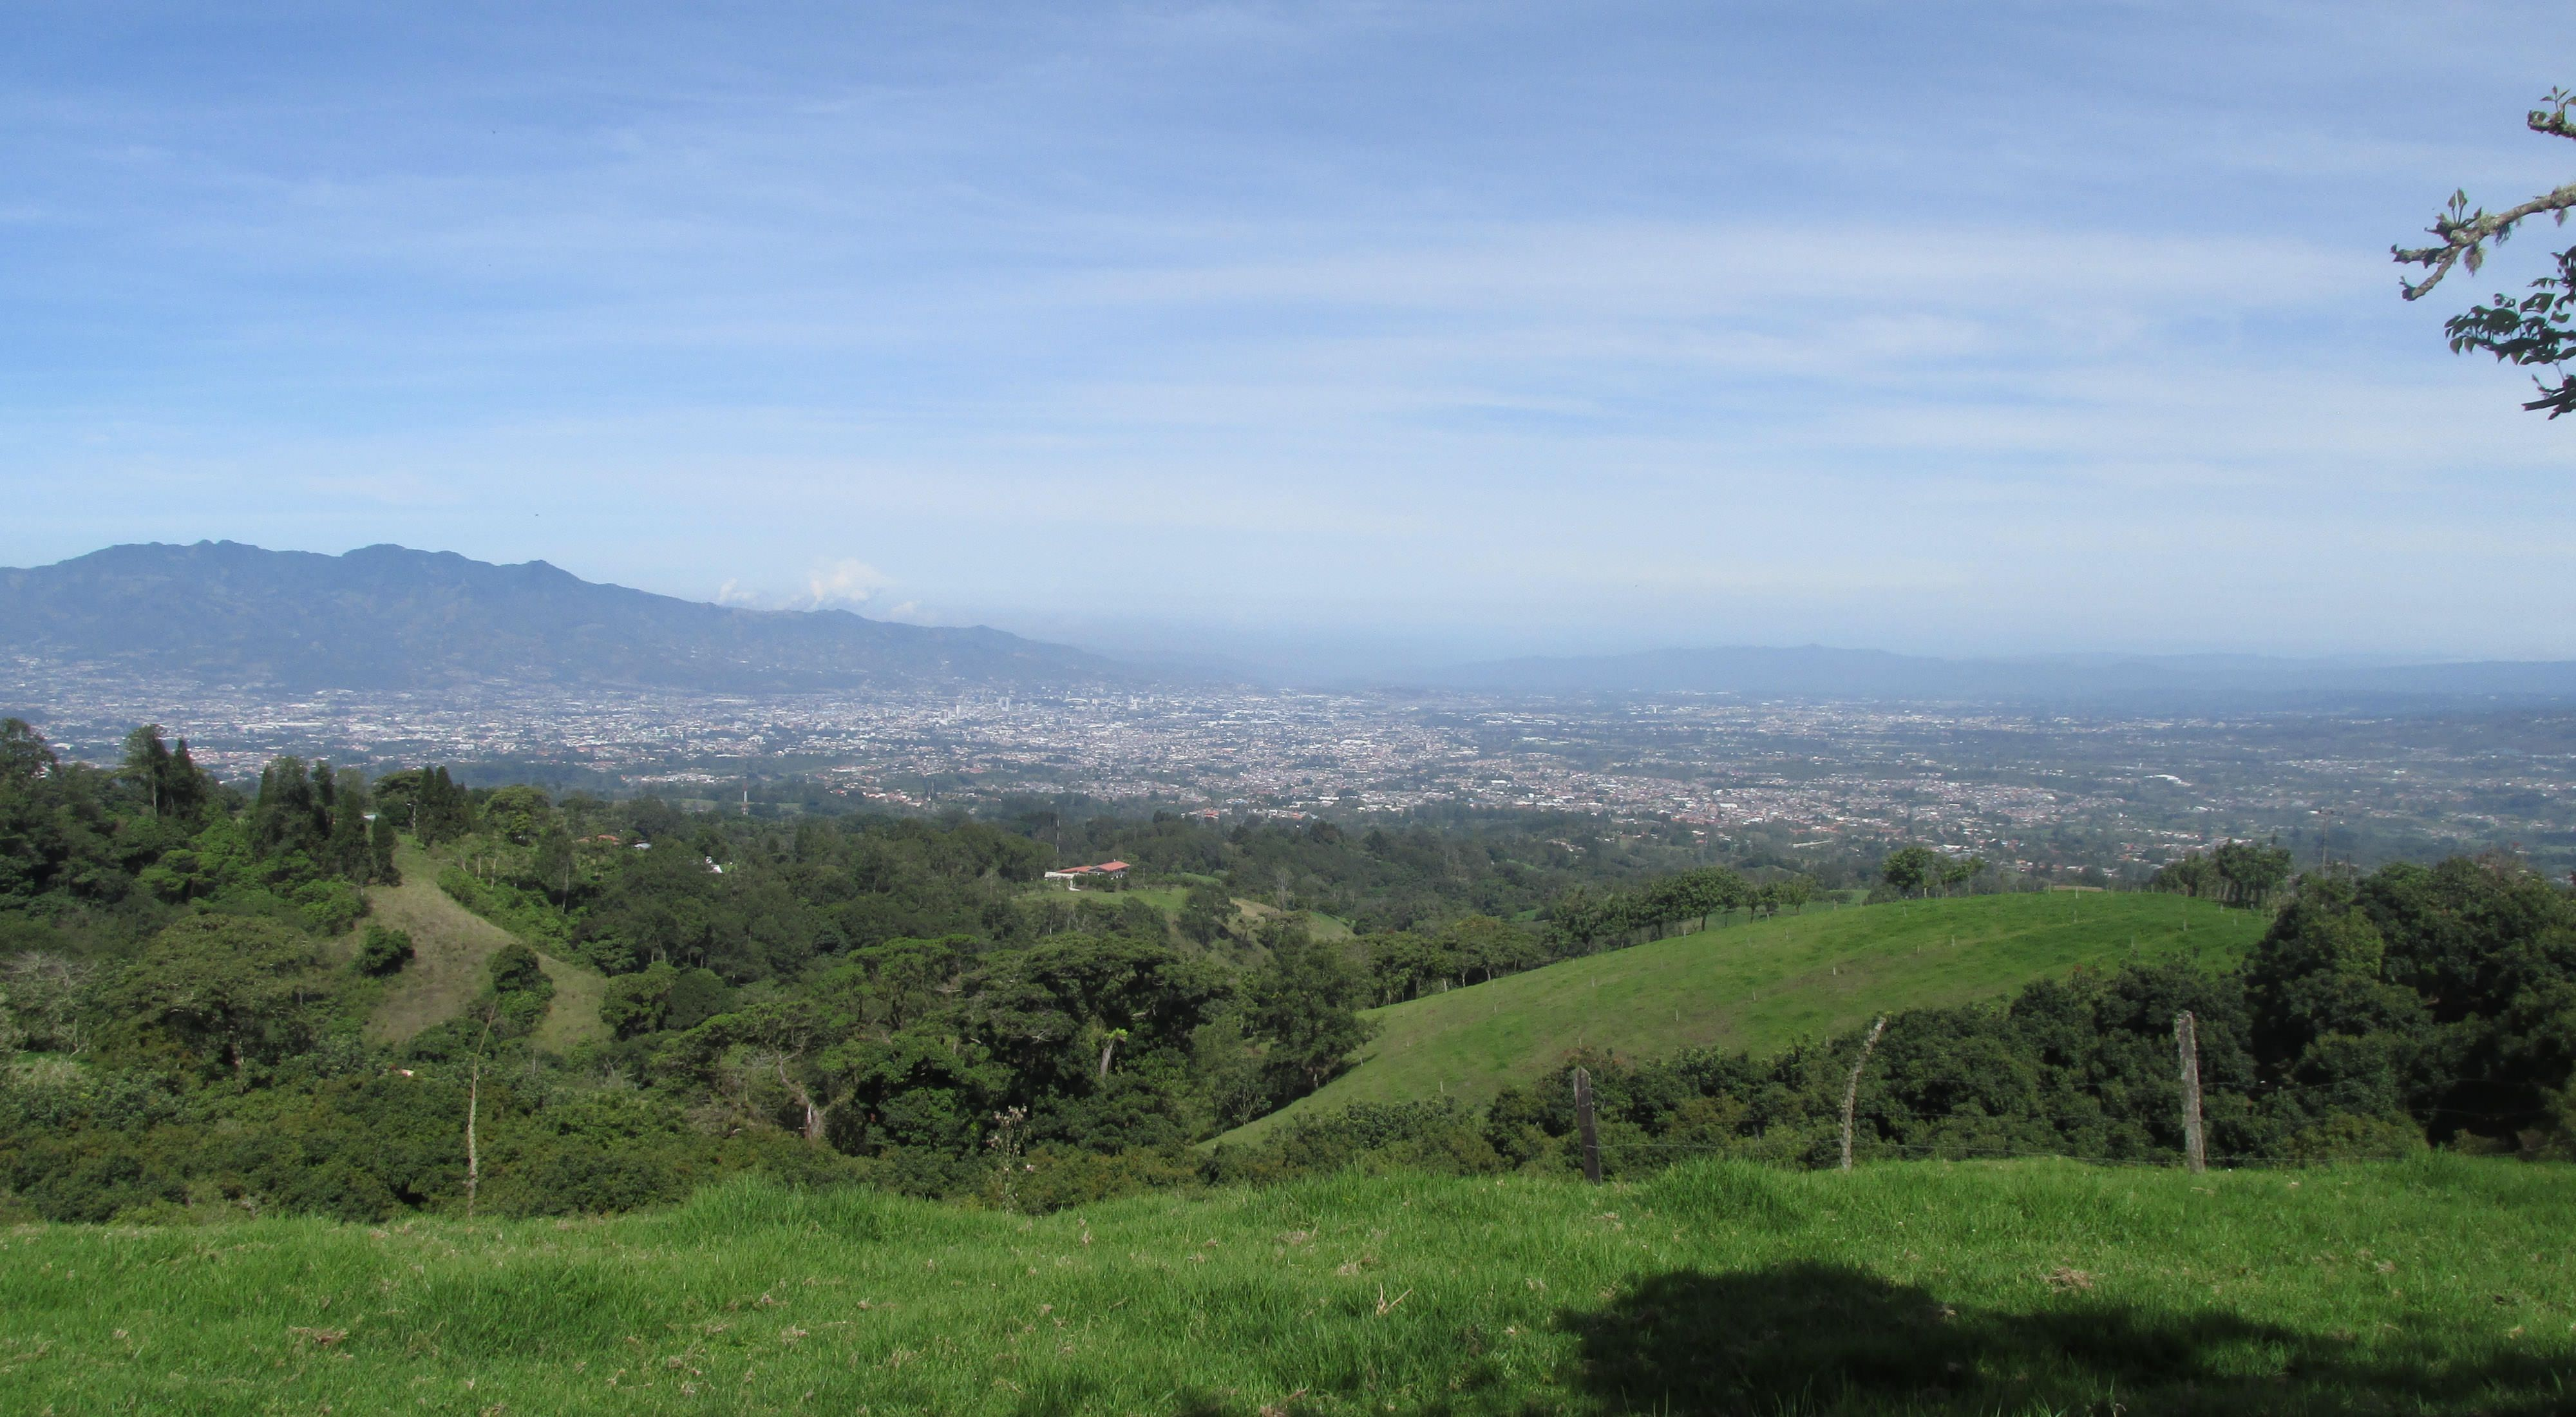 Vista de San José, Costa Rica